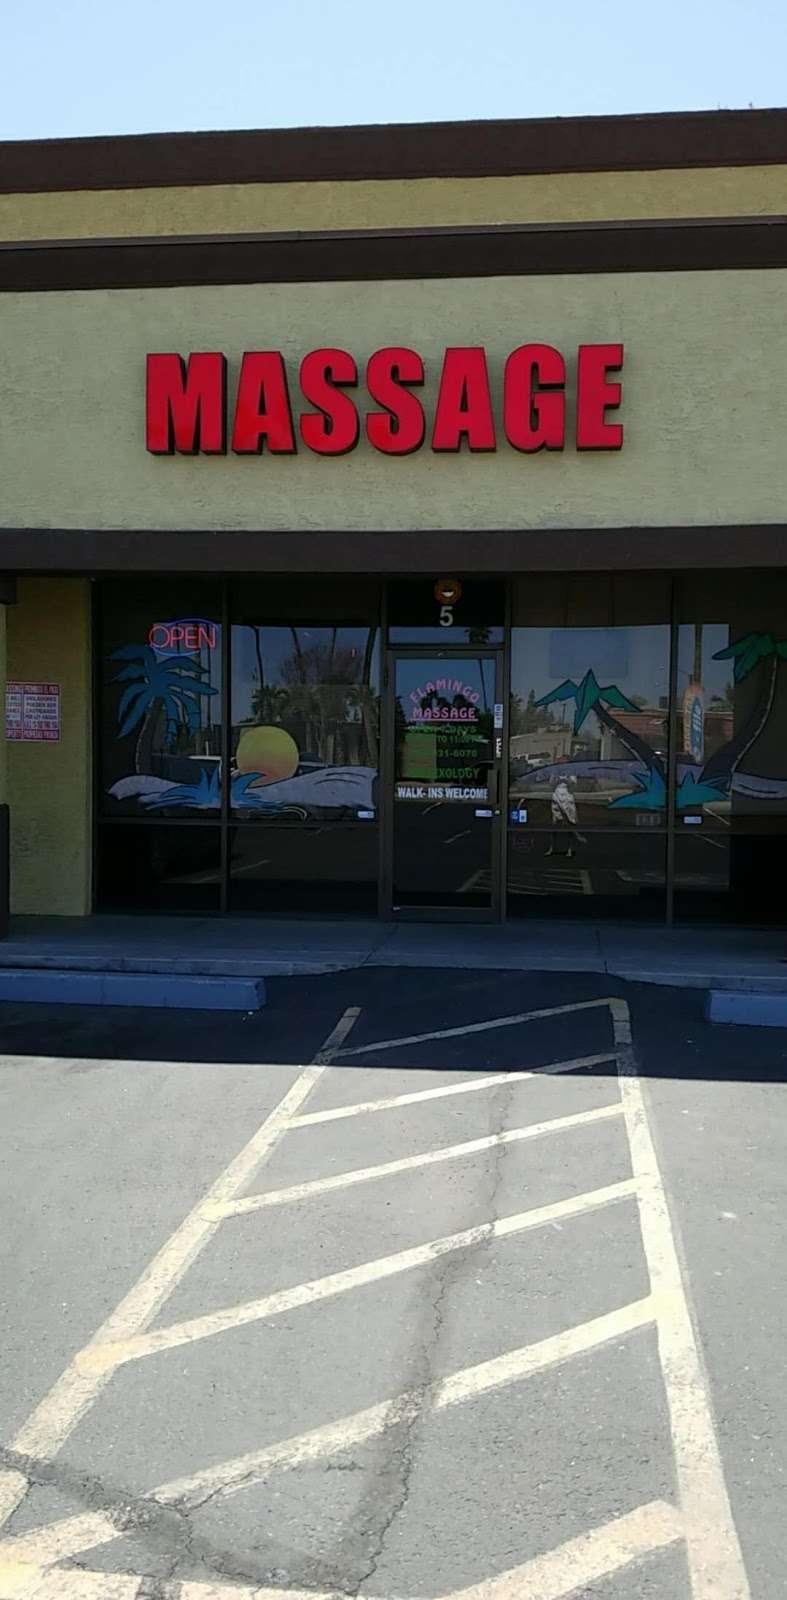 Asian Massage Flamingo Spa - spa  | Photo 8 of 10 | Address: 4935 W Glendale Ave #5, Glendale, AZ 85301, USA | Phone: (623) 931-6076